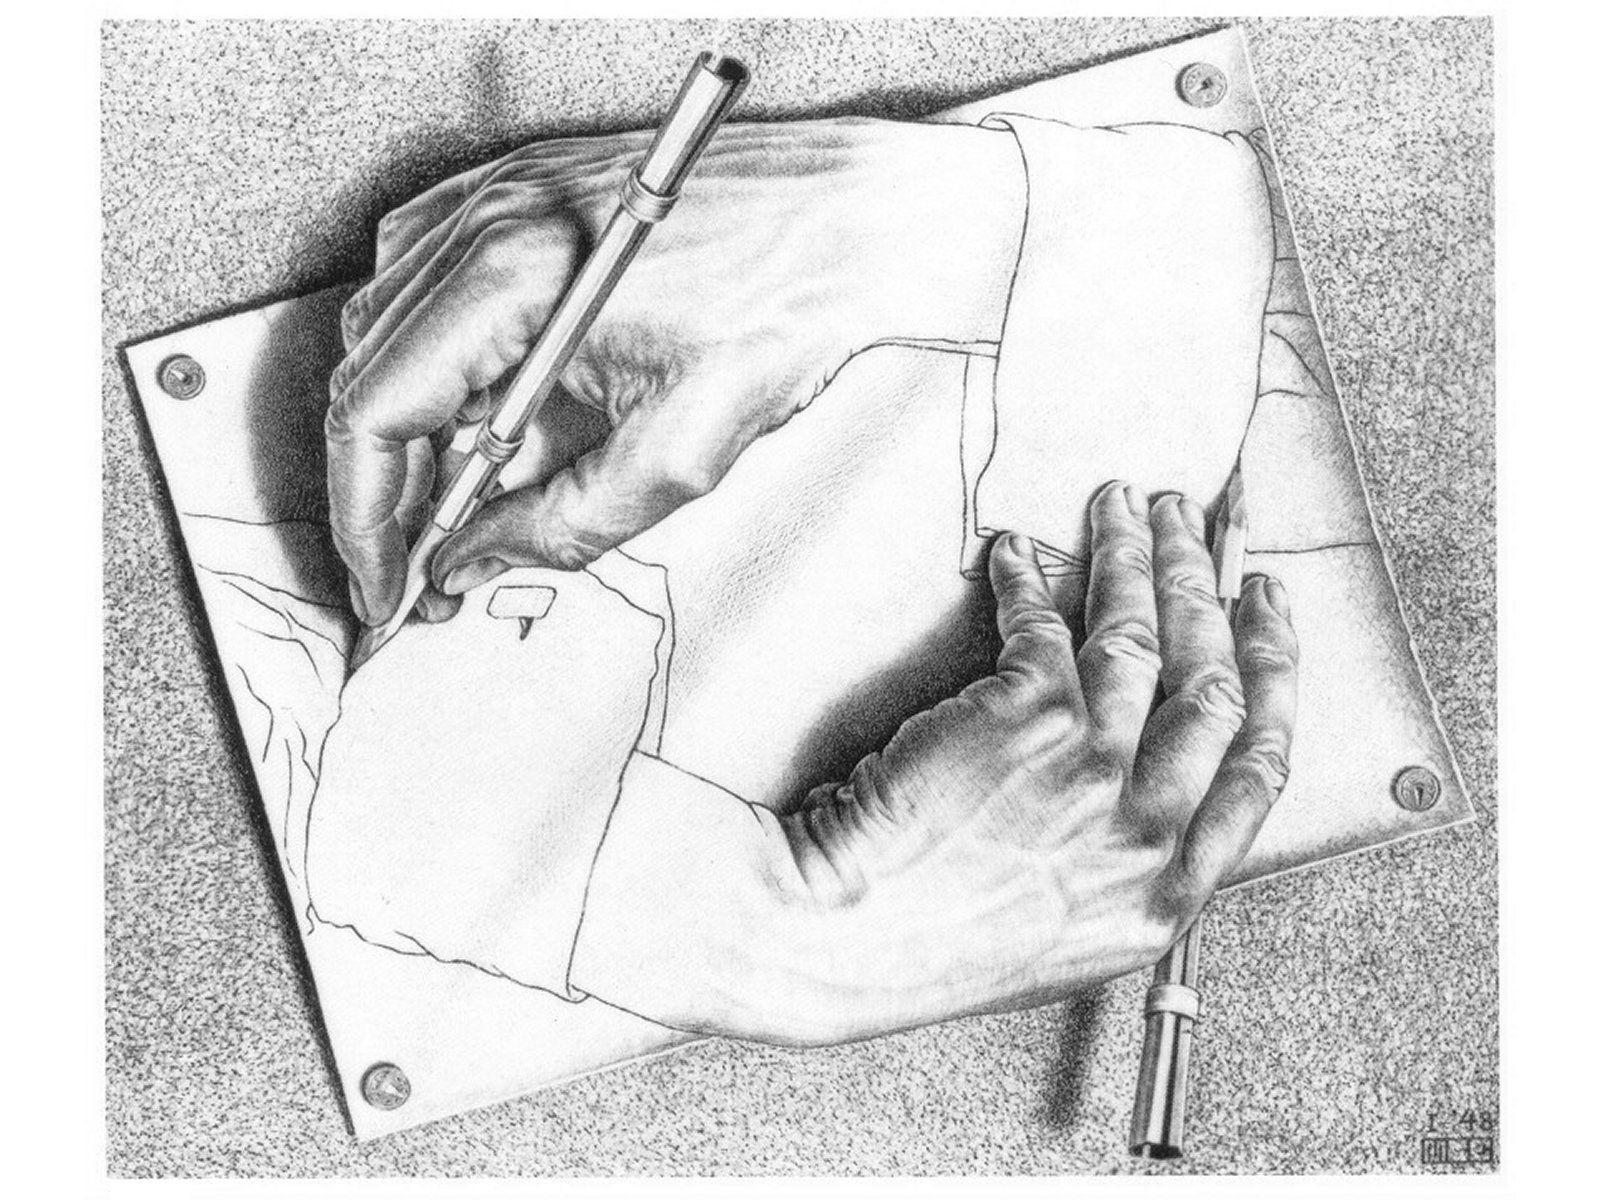 Drawing drawing itself